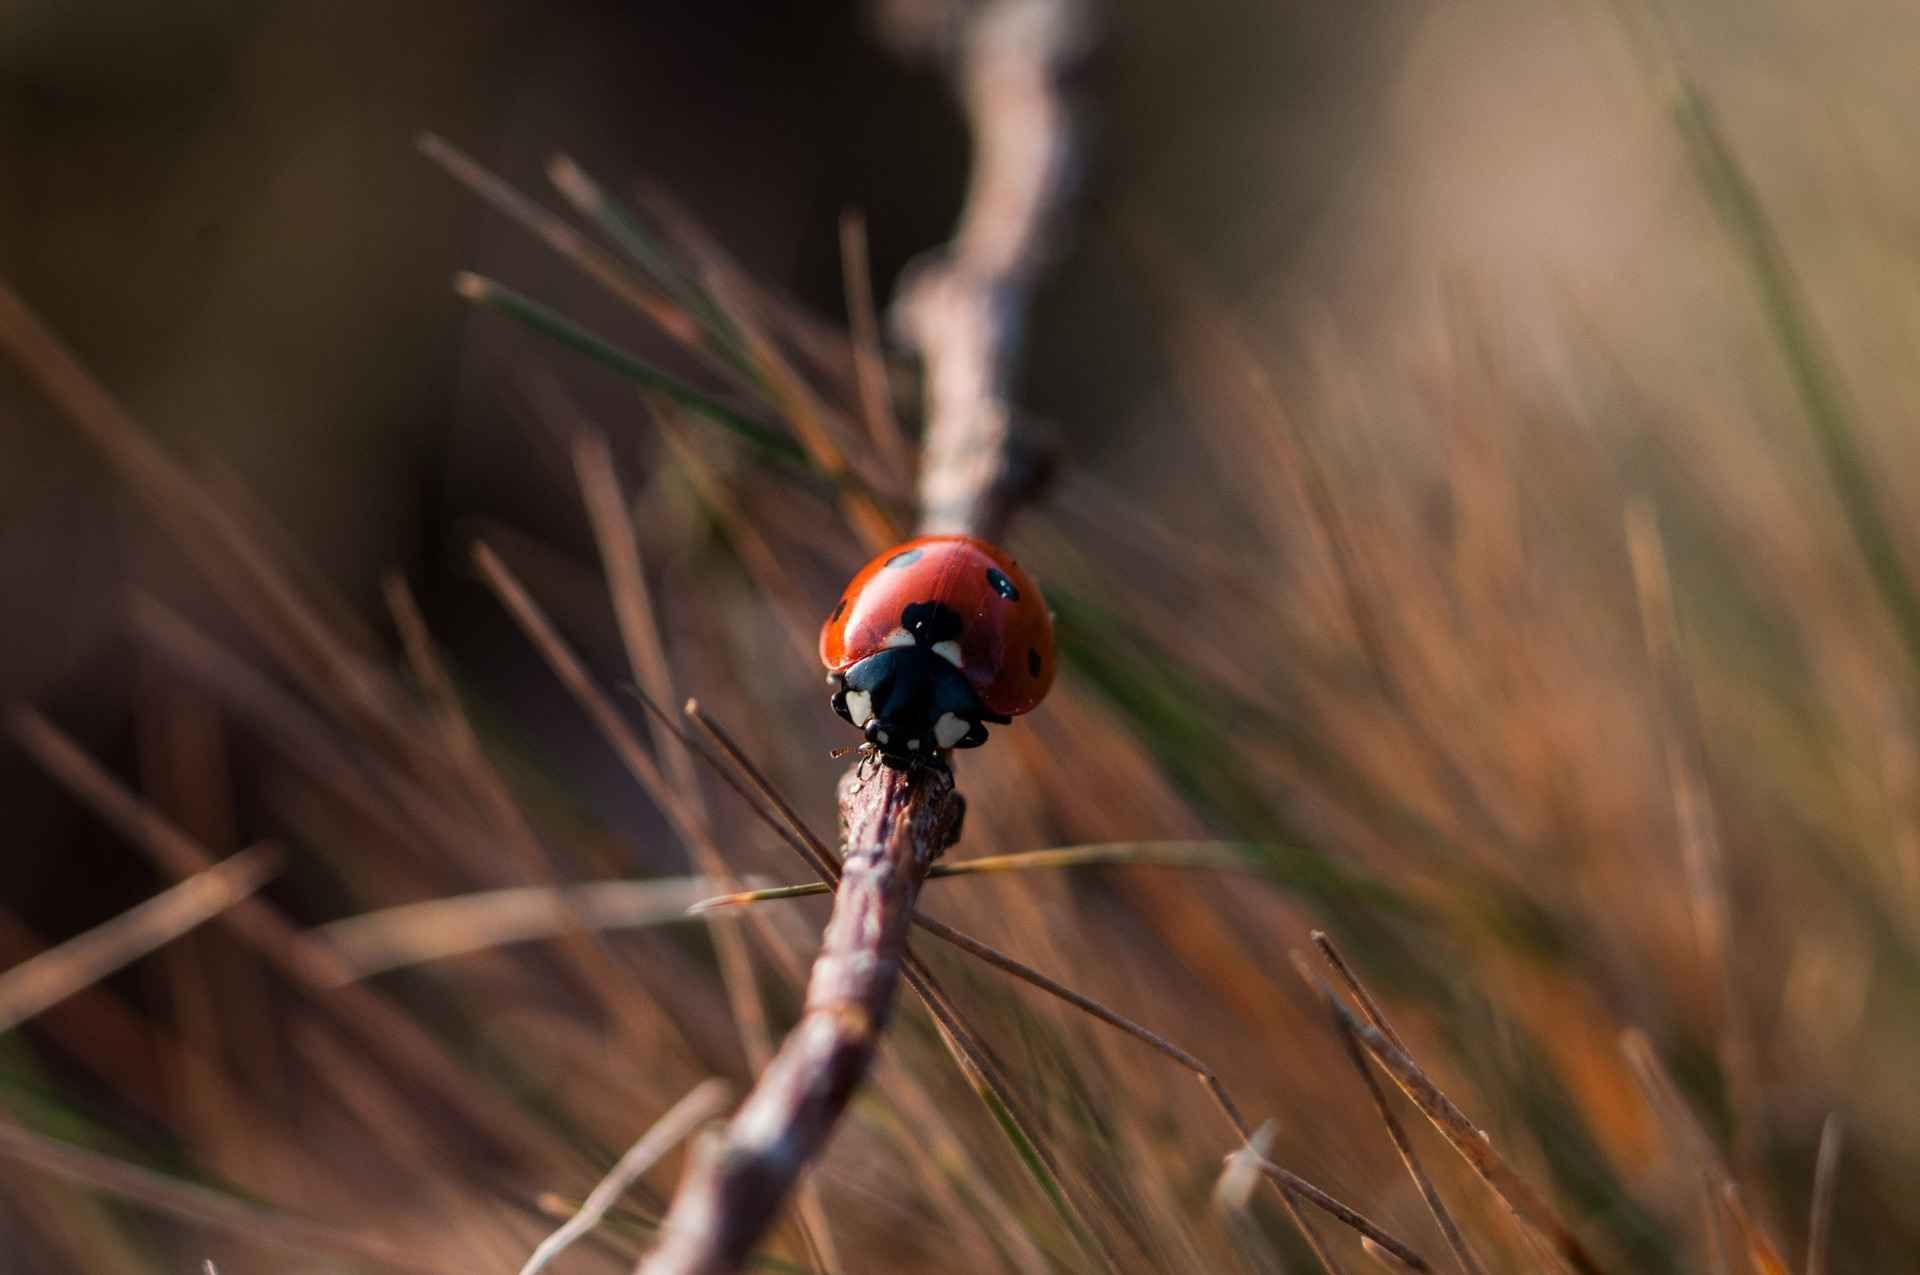 ladybug-crawl-lone-branch